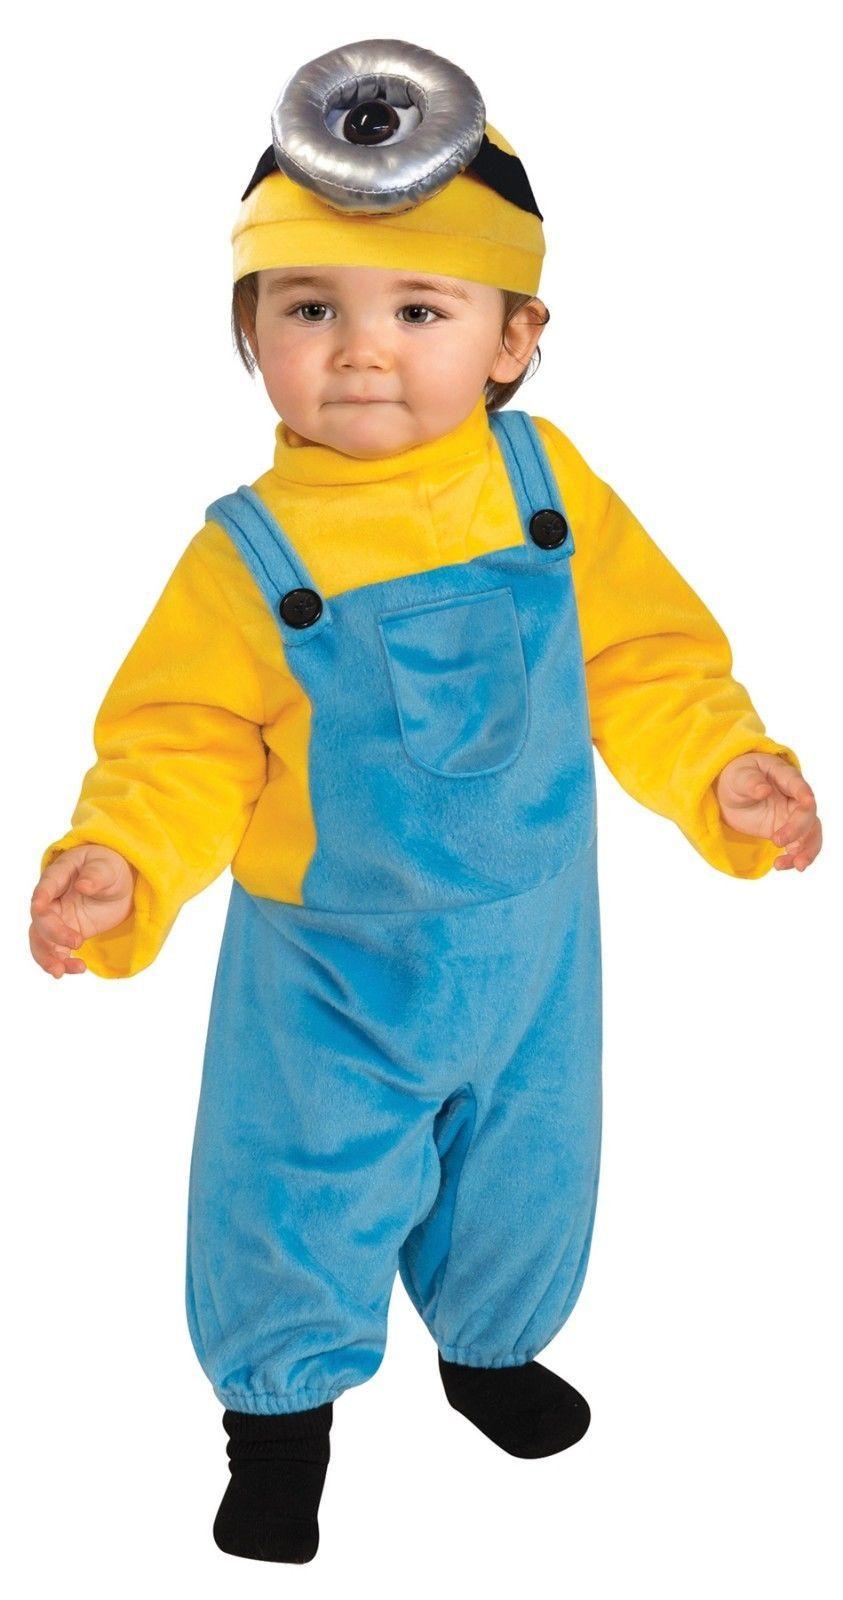 Toddler Minion Stuart/Stewart/Fits 3T-4T/Rubies/Licensed Universal Studio